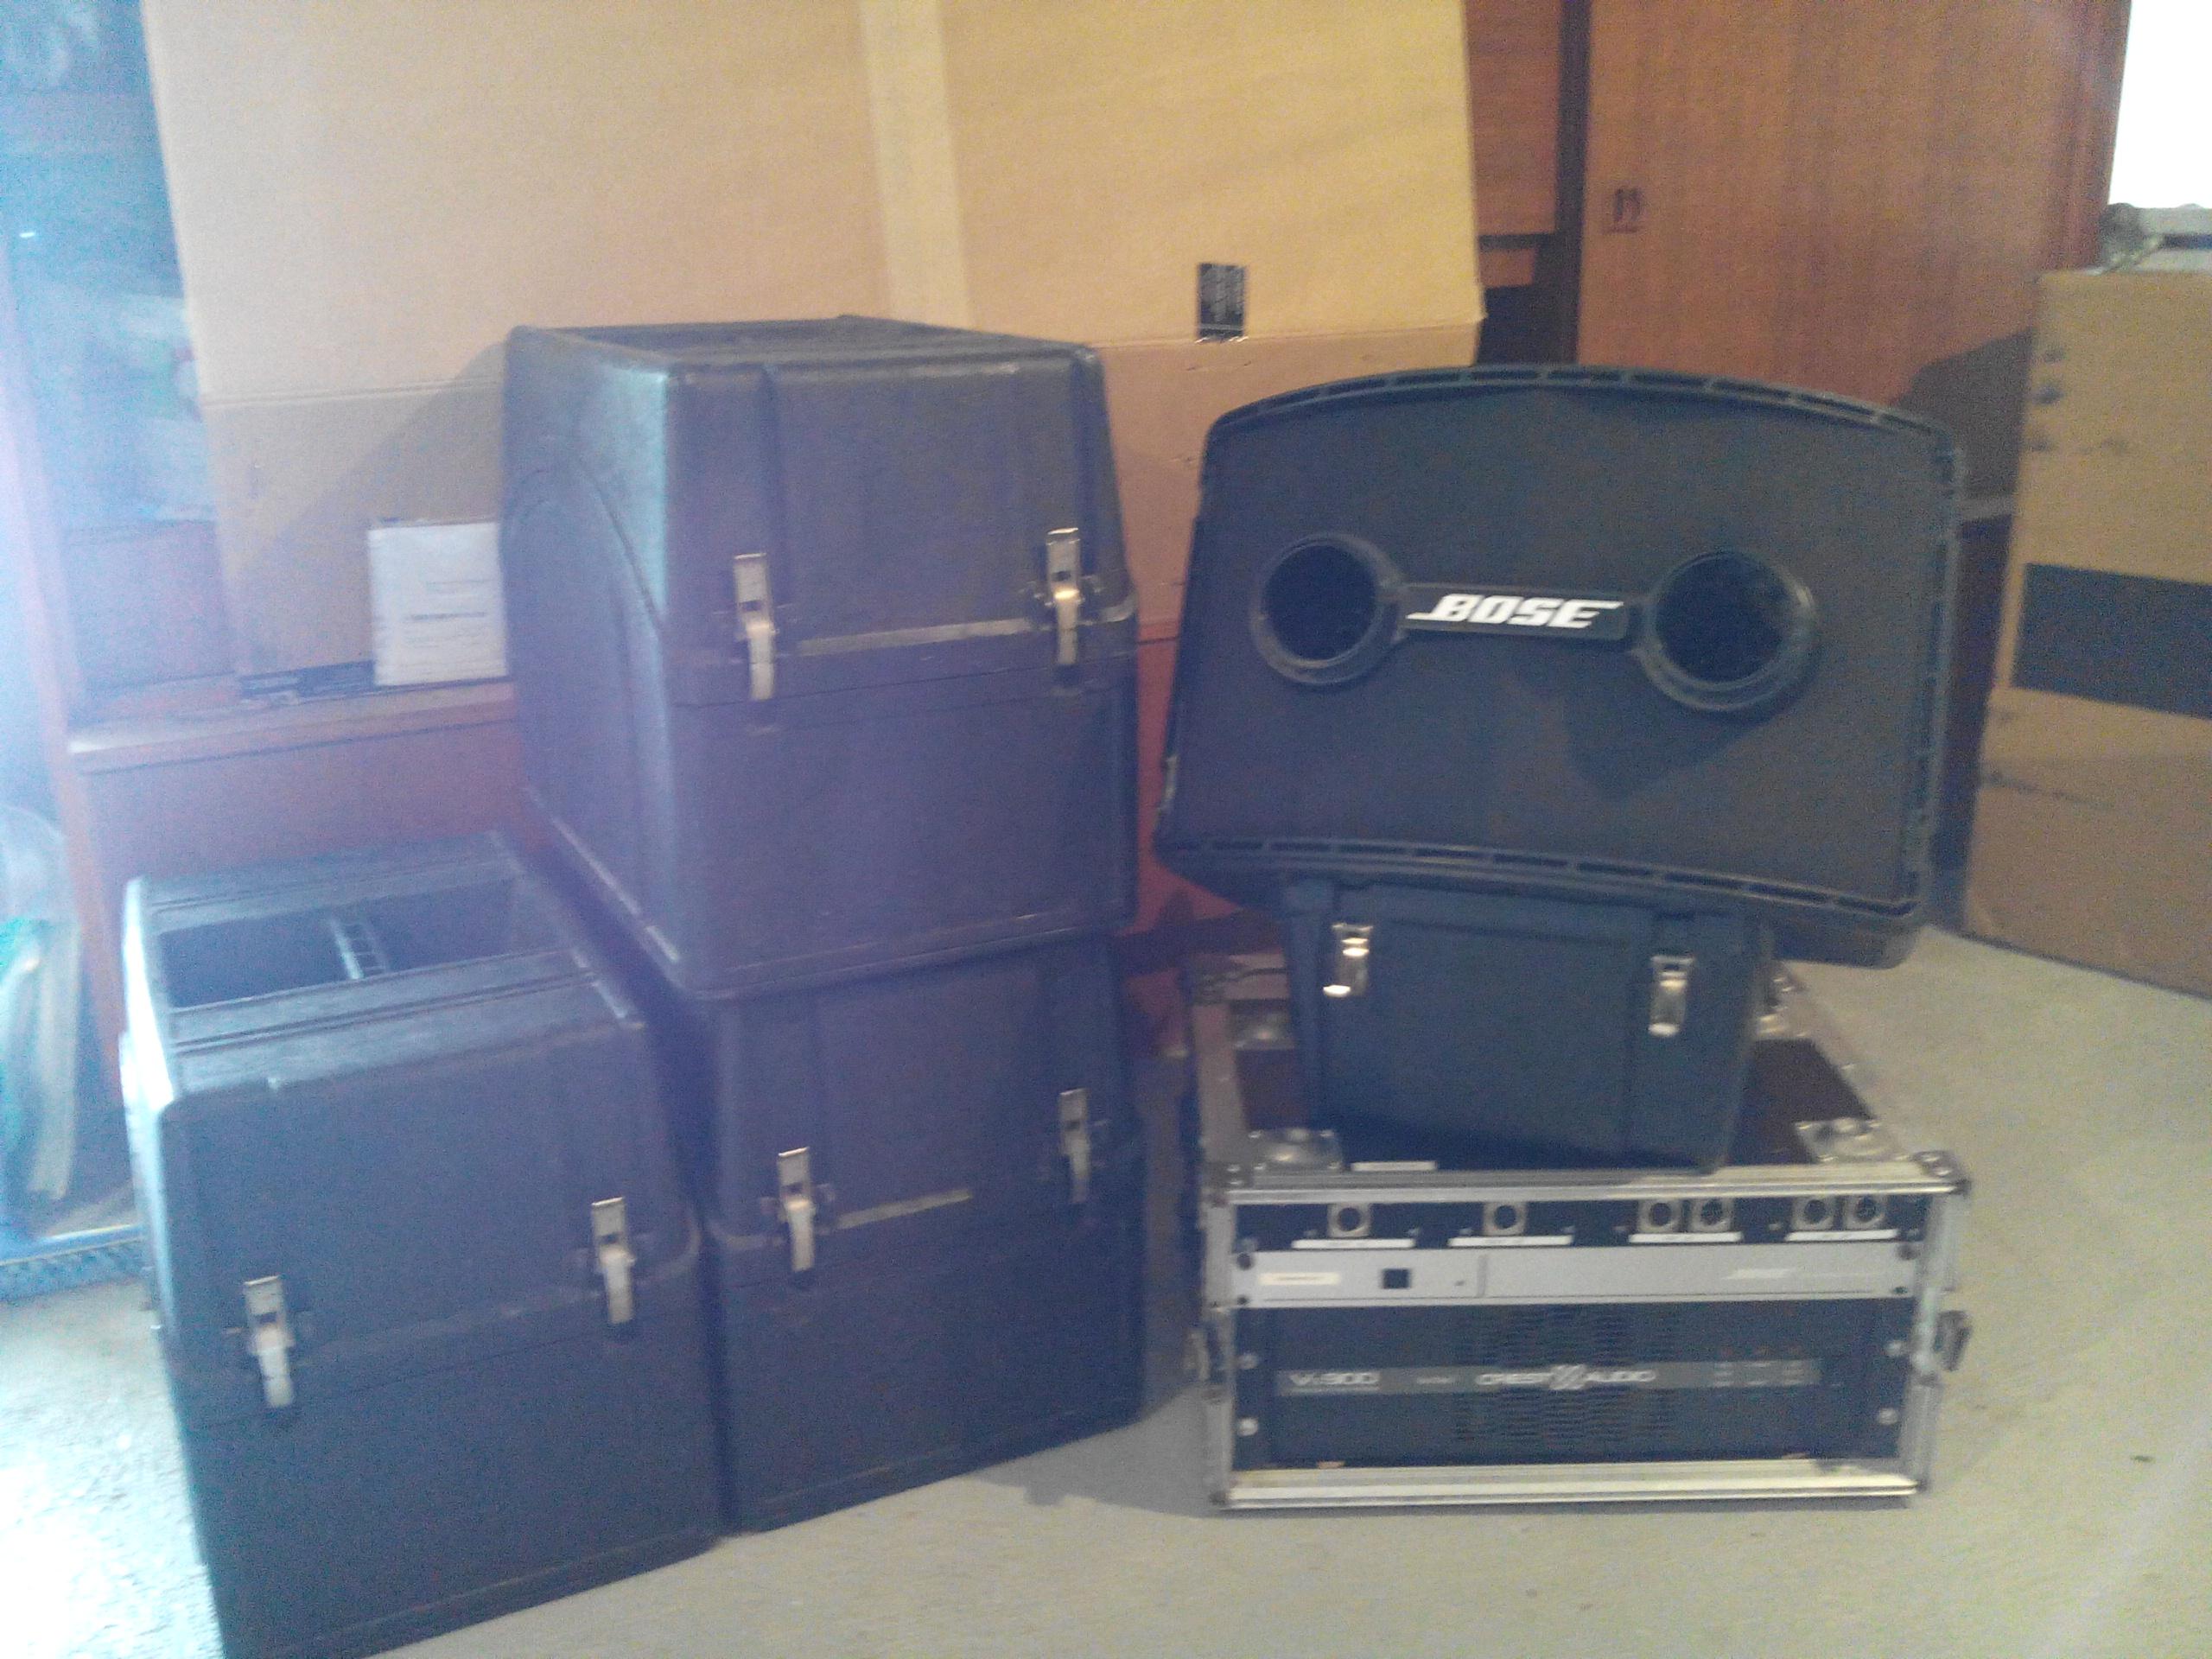 photo bose 802 series ii bose 802 series ii 54799 1181557 audiofanzine. Black Bedroom Furniture Sets. Home Design Ideas